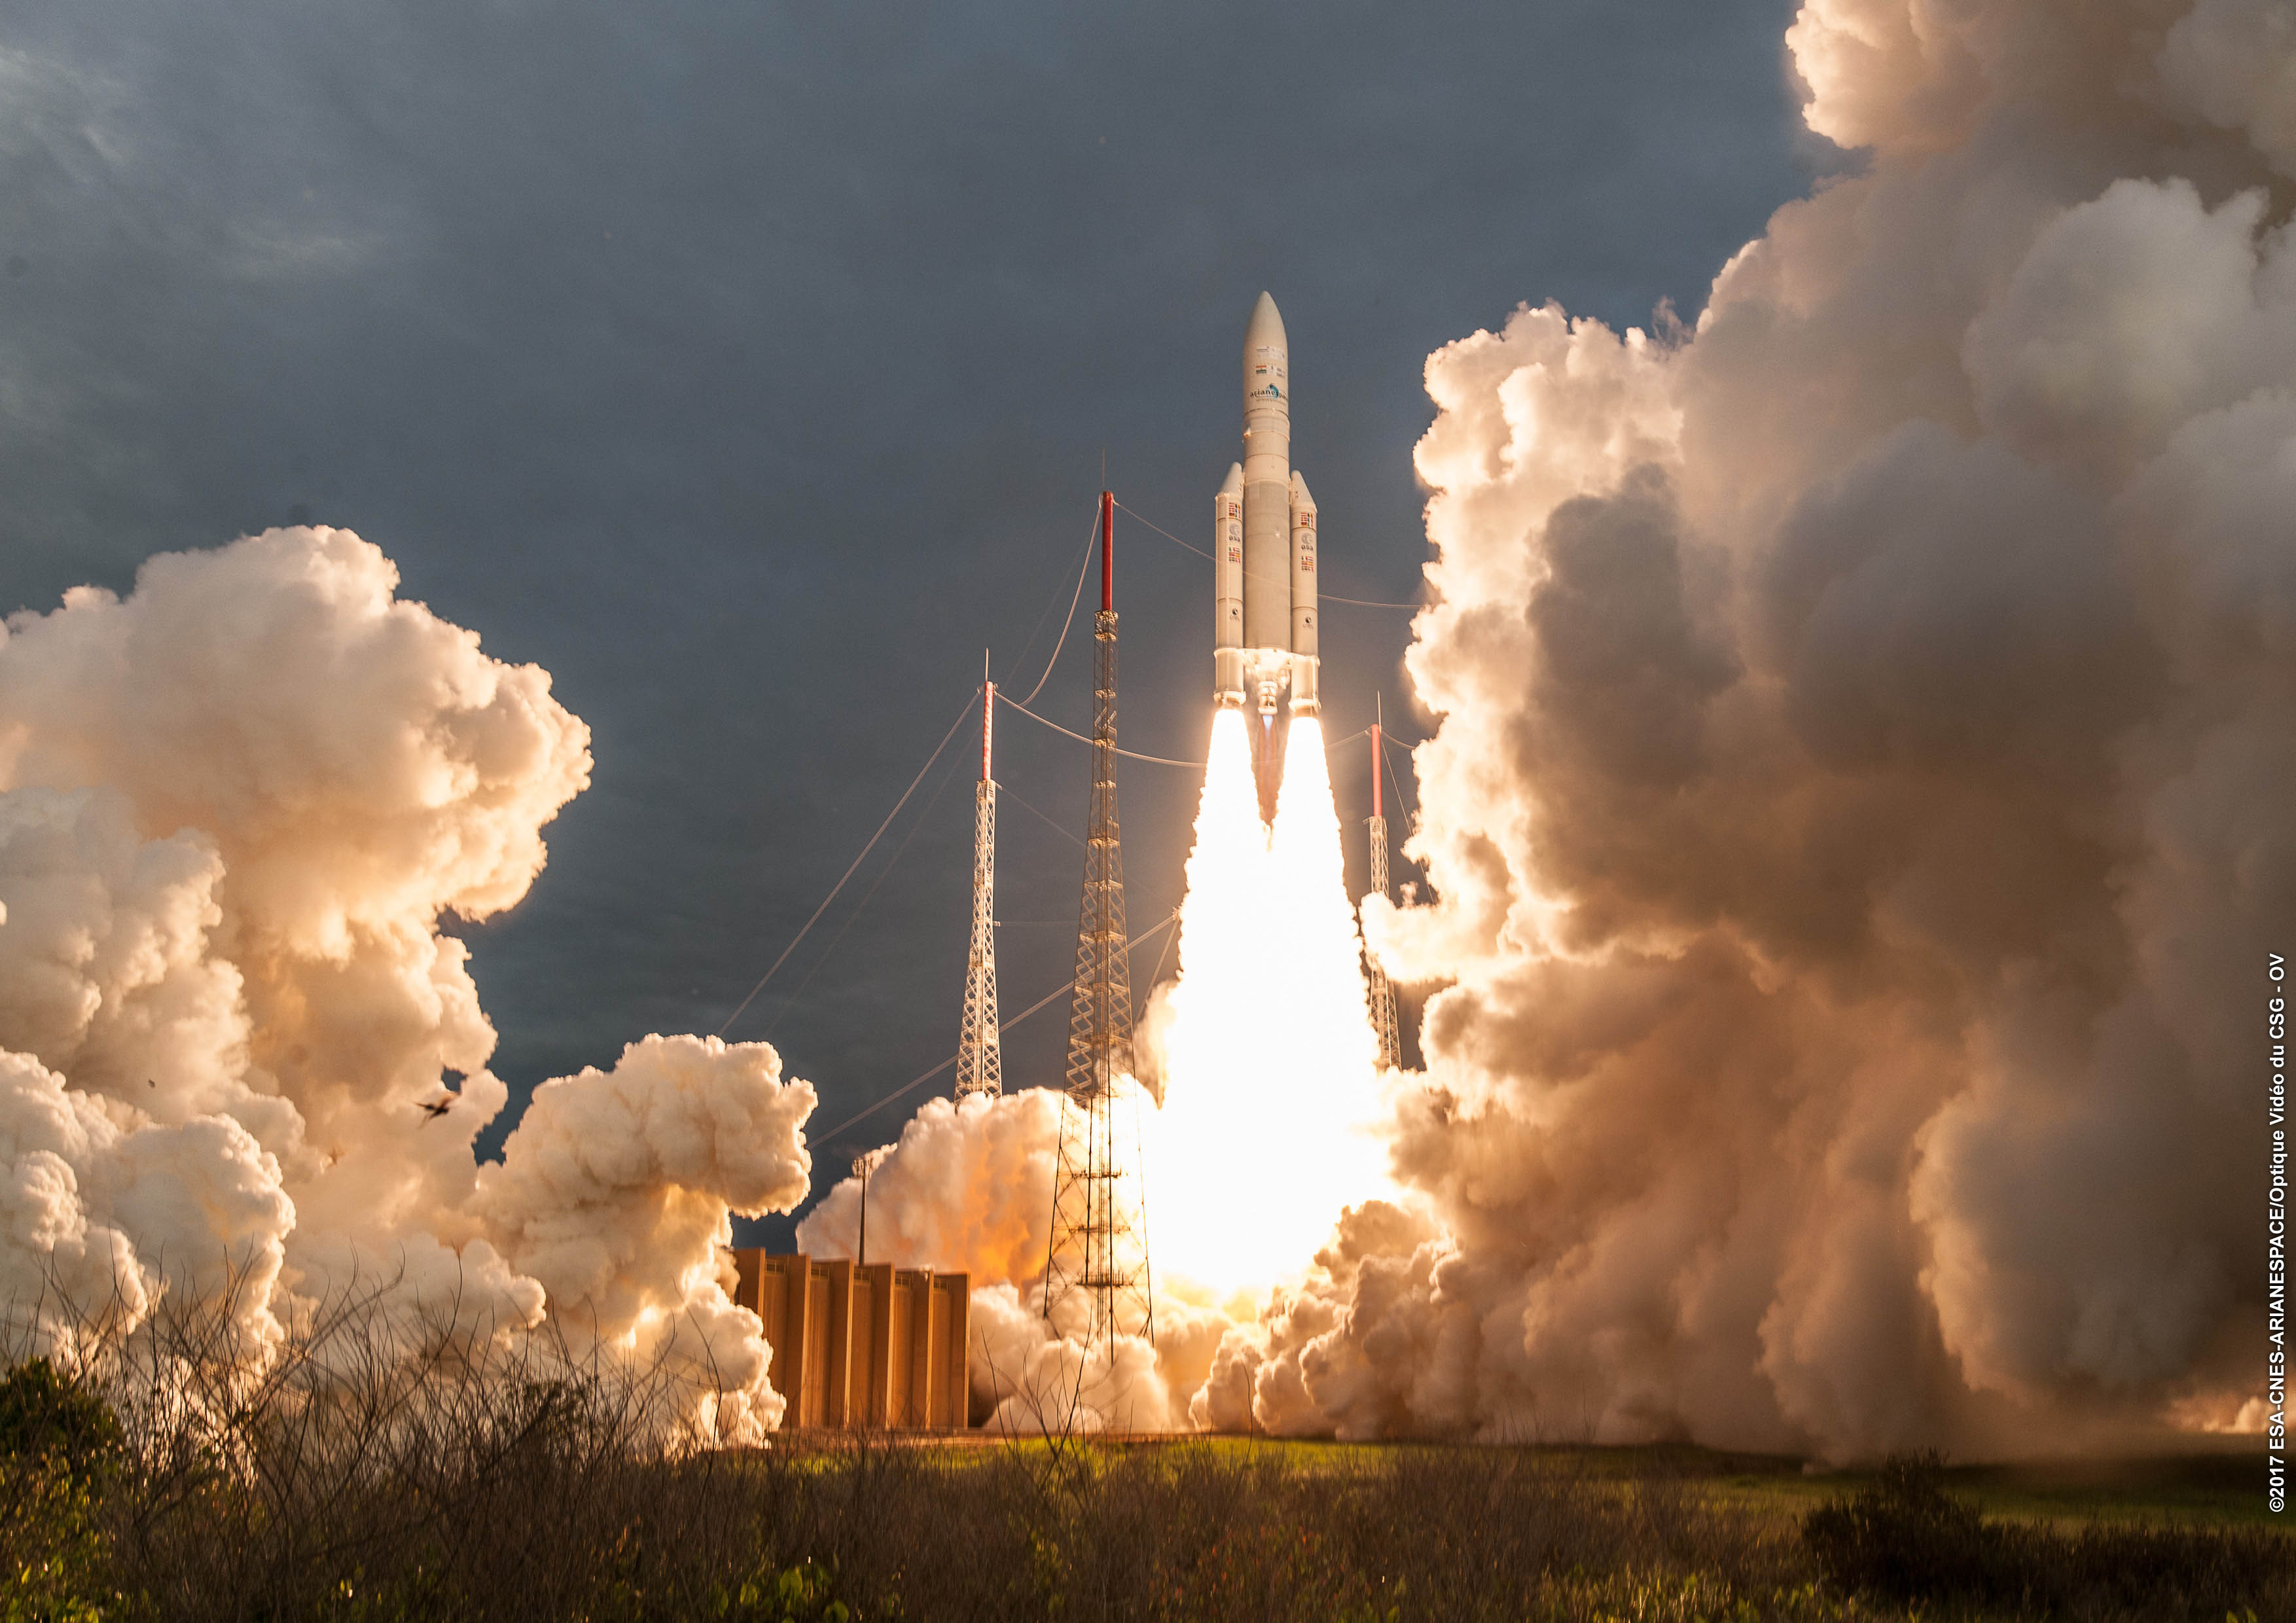 100e lancement d'Ariane 5 : La campagne #withariane bat son plein